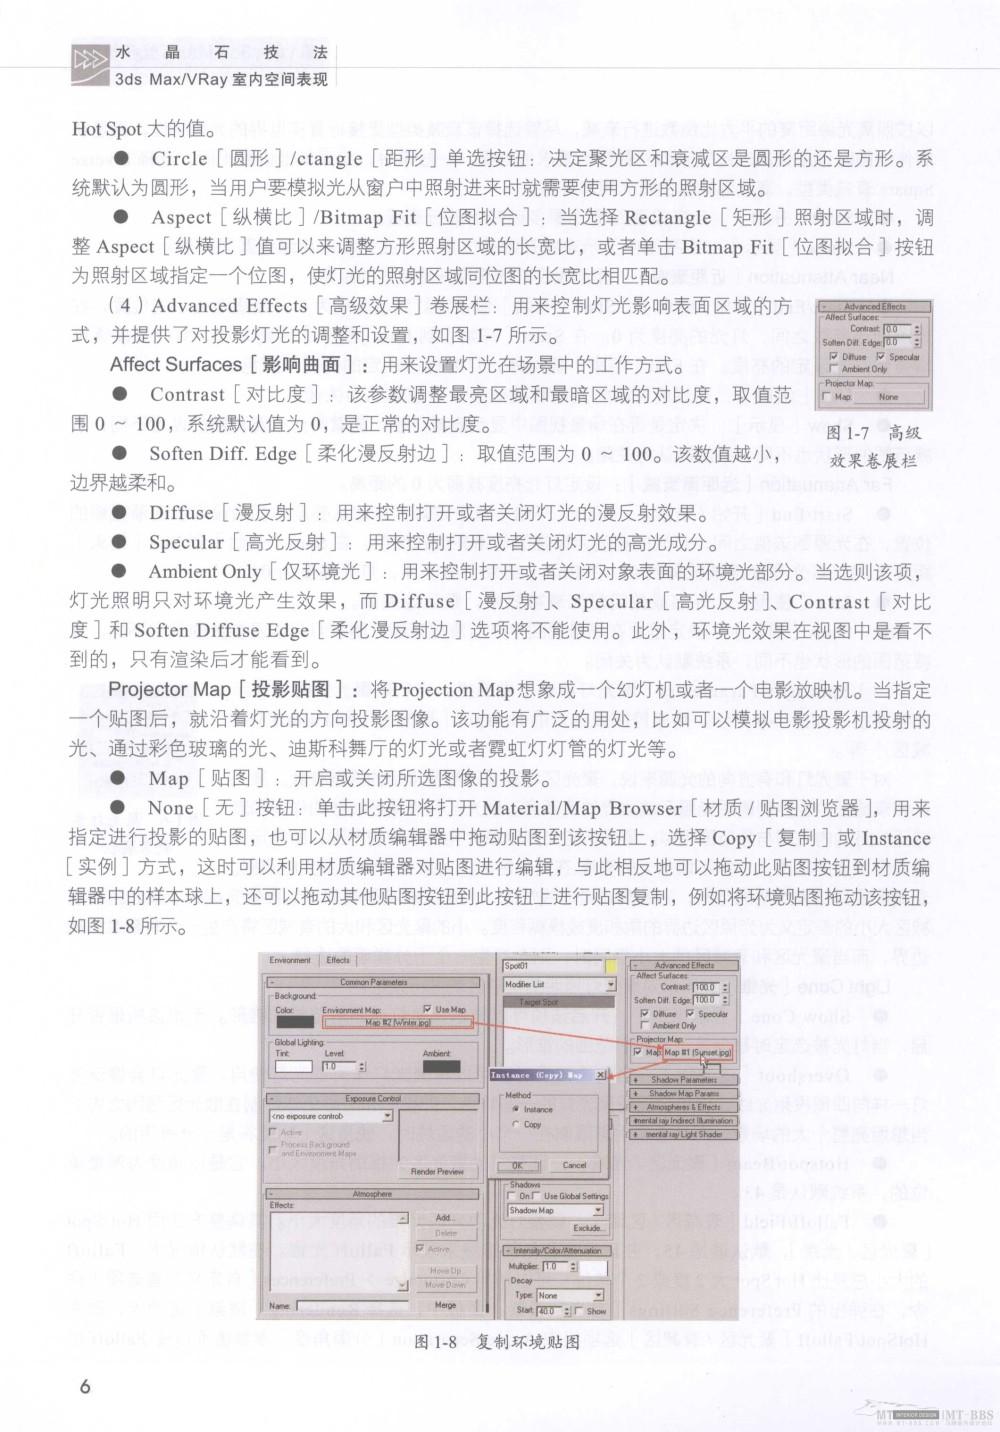 水晶石技法-3ds_Max&VRay室内空间表现_水晶石技法-3ds_Max&VRay室内空间表现_页面_012.jpg